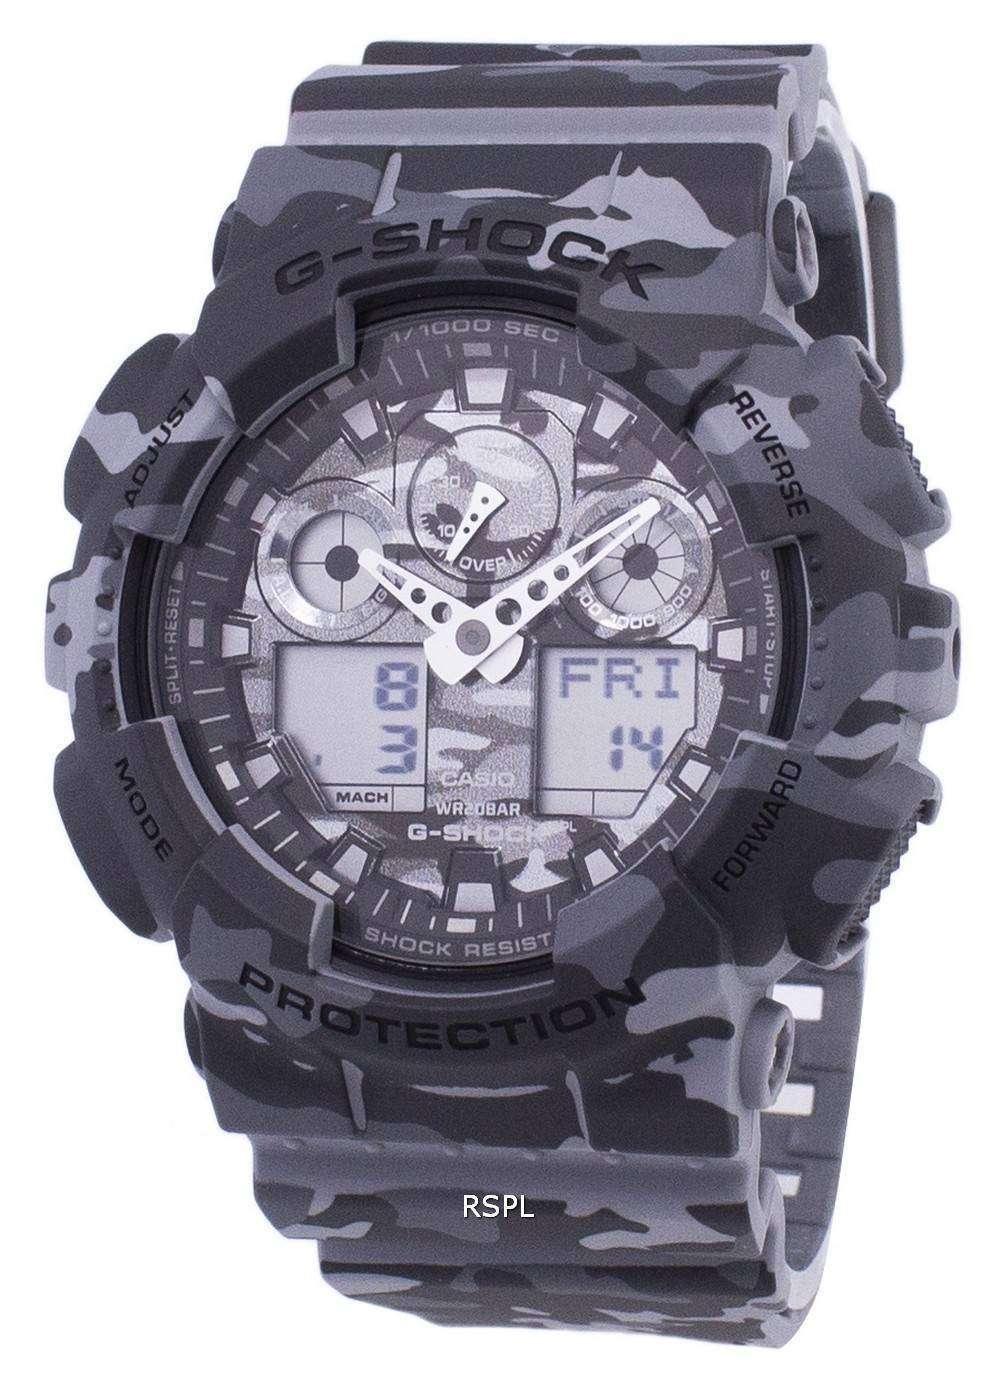 6b1456b9a4ea Reloj Casio G-Shock camuflaje serie analógica Digital GA-100CM-8A de ...